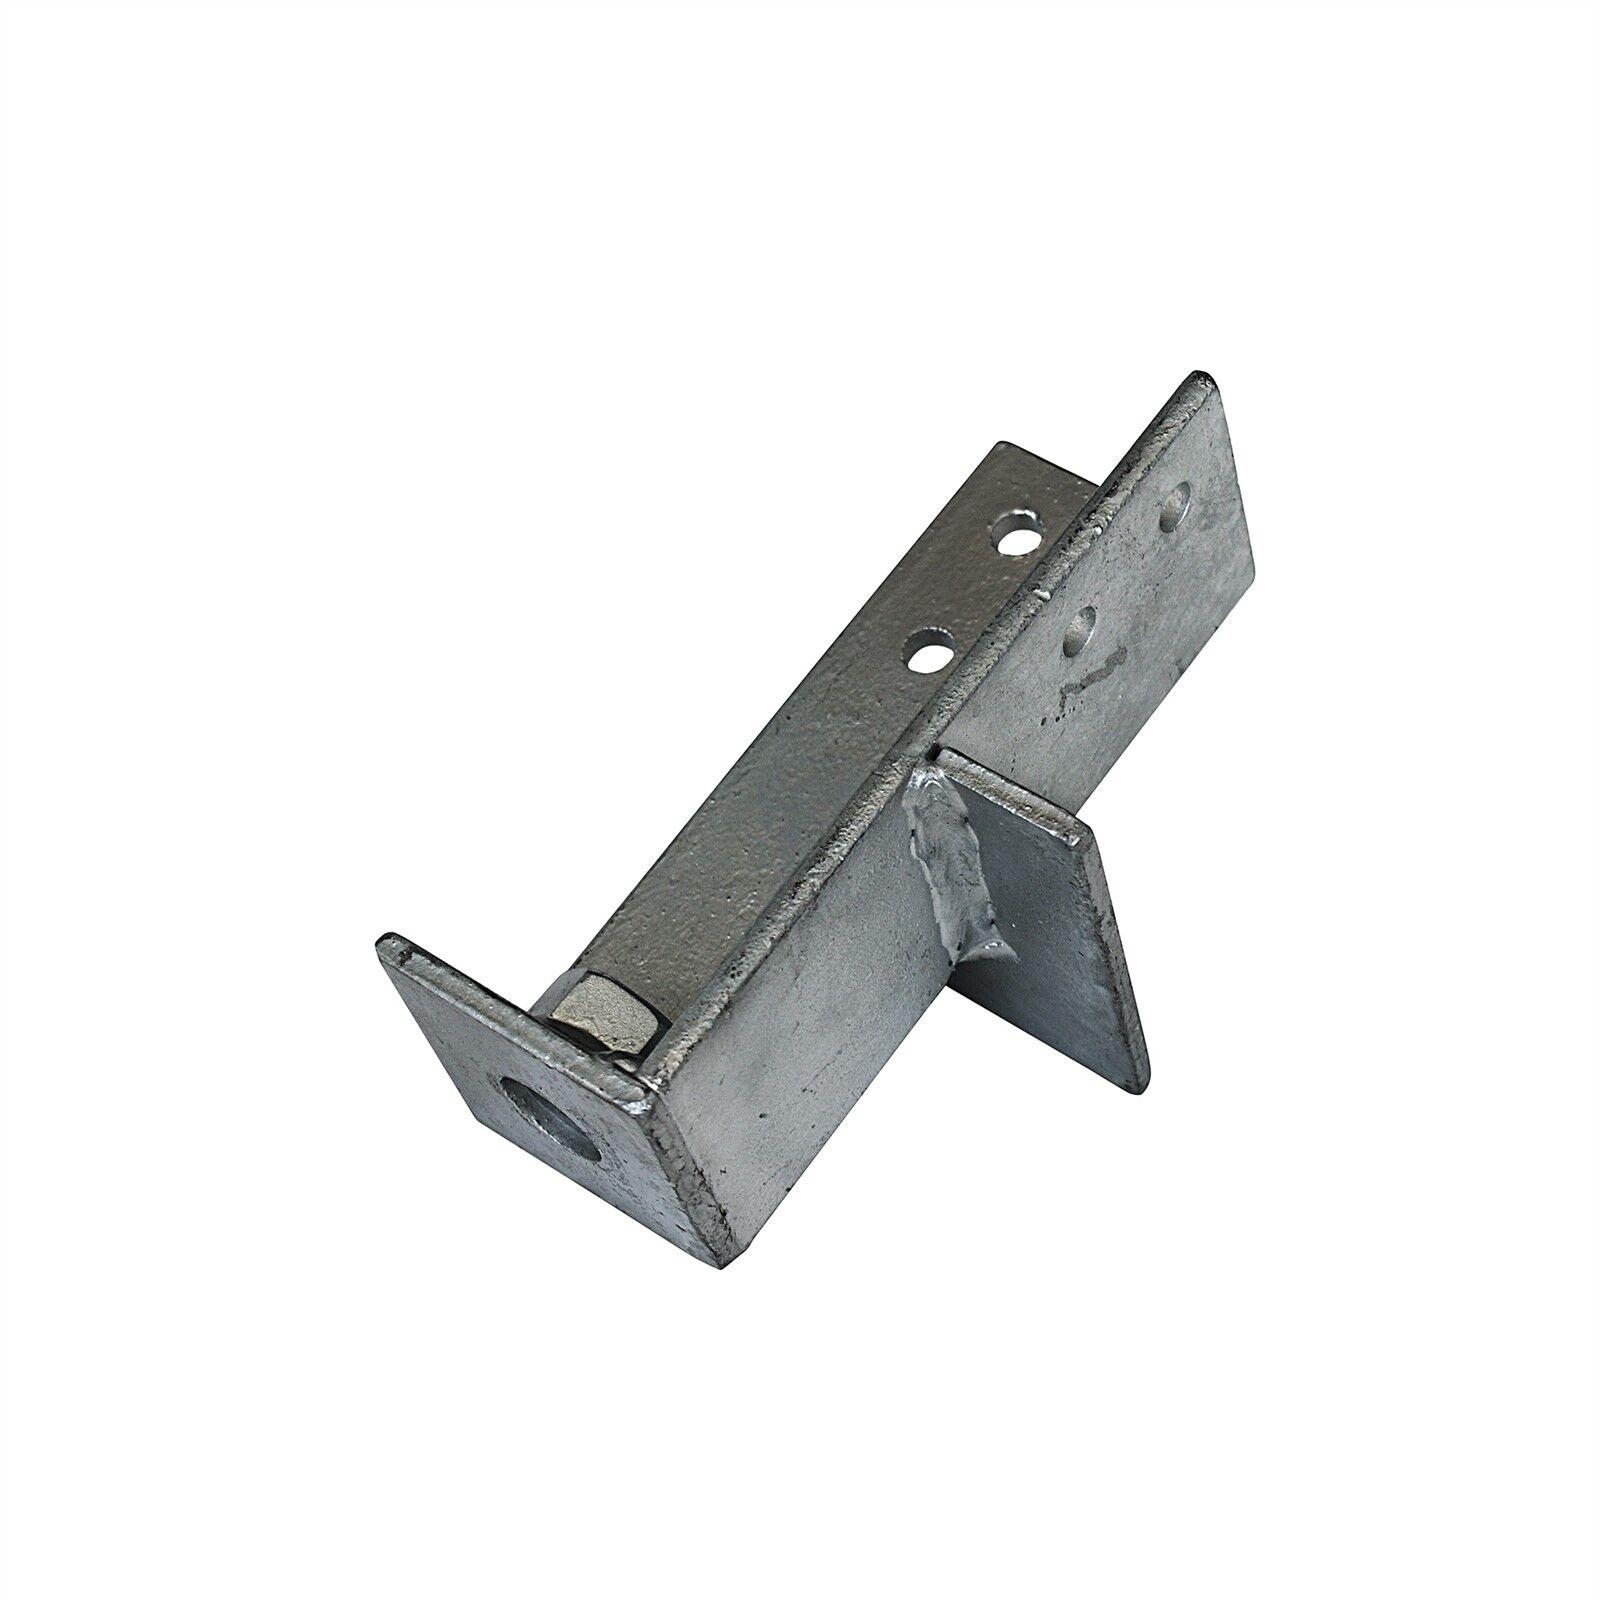 Good Times MODULAR DECKING STEEL SUPPORT Aust Brand- 140mm,270mm,400mm Or 530mm